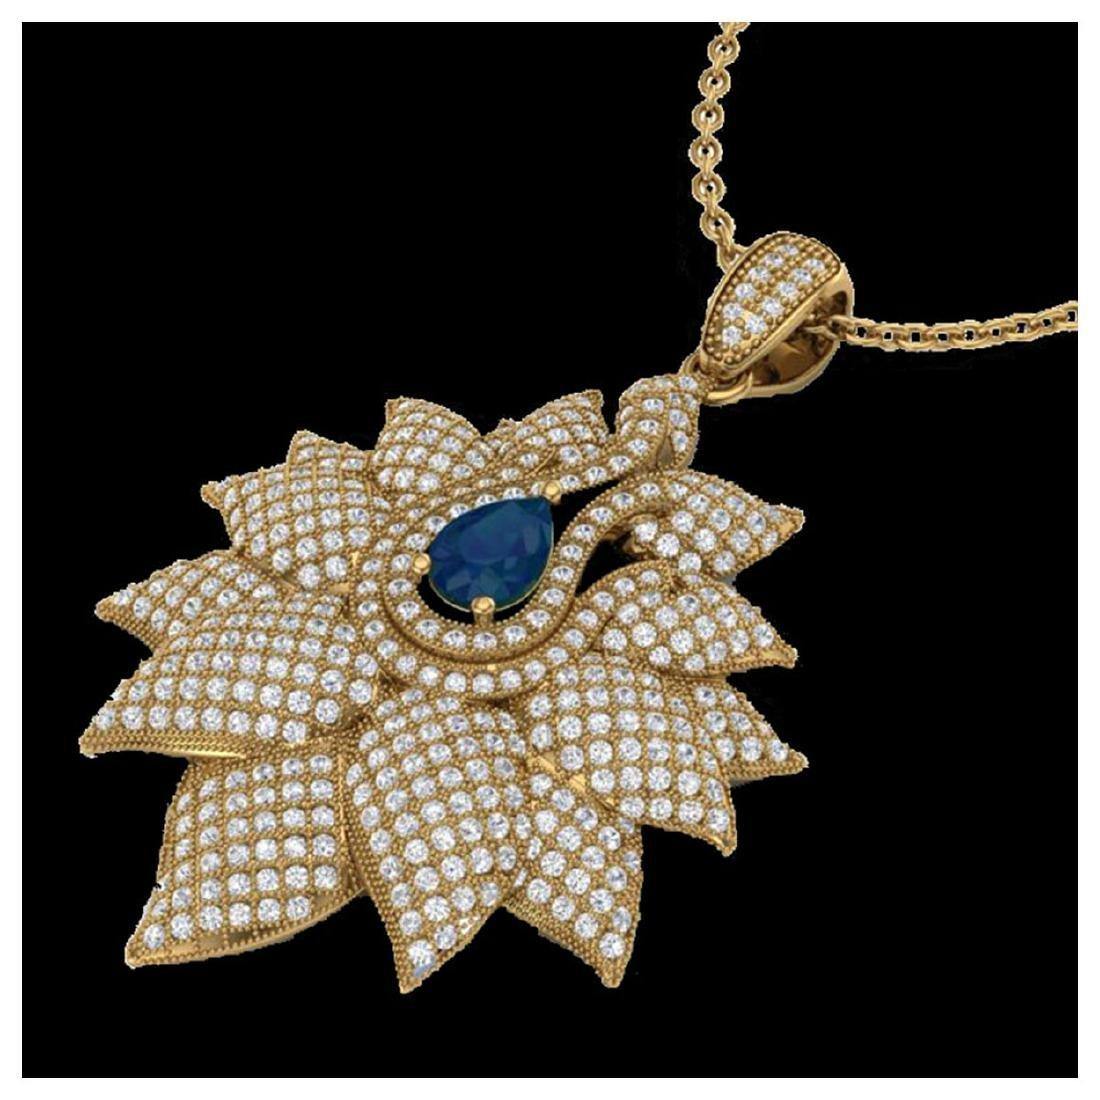 3 ctw Sapphire & VS/SI Diamond Necklace 18K Yellow Gold